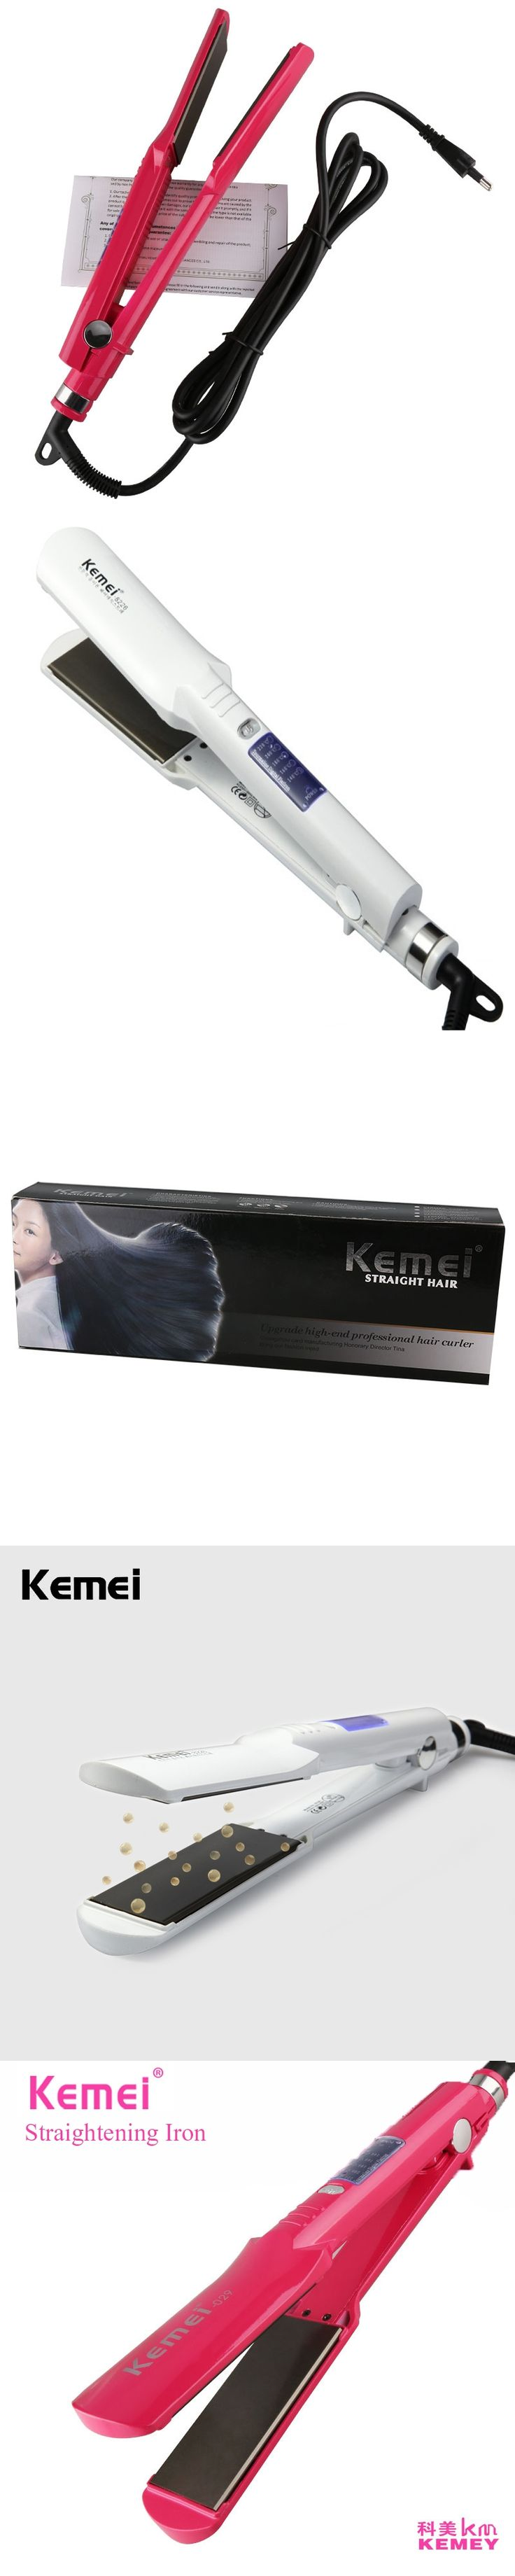 KEMEI 2017 LCD Professional Hair Straightener Hair Curler Electric Splint Steam Curling Iron Straightening Perm Curler BT-261